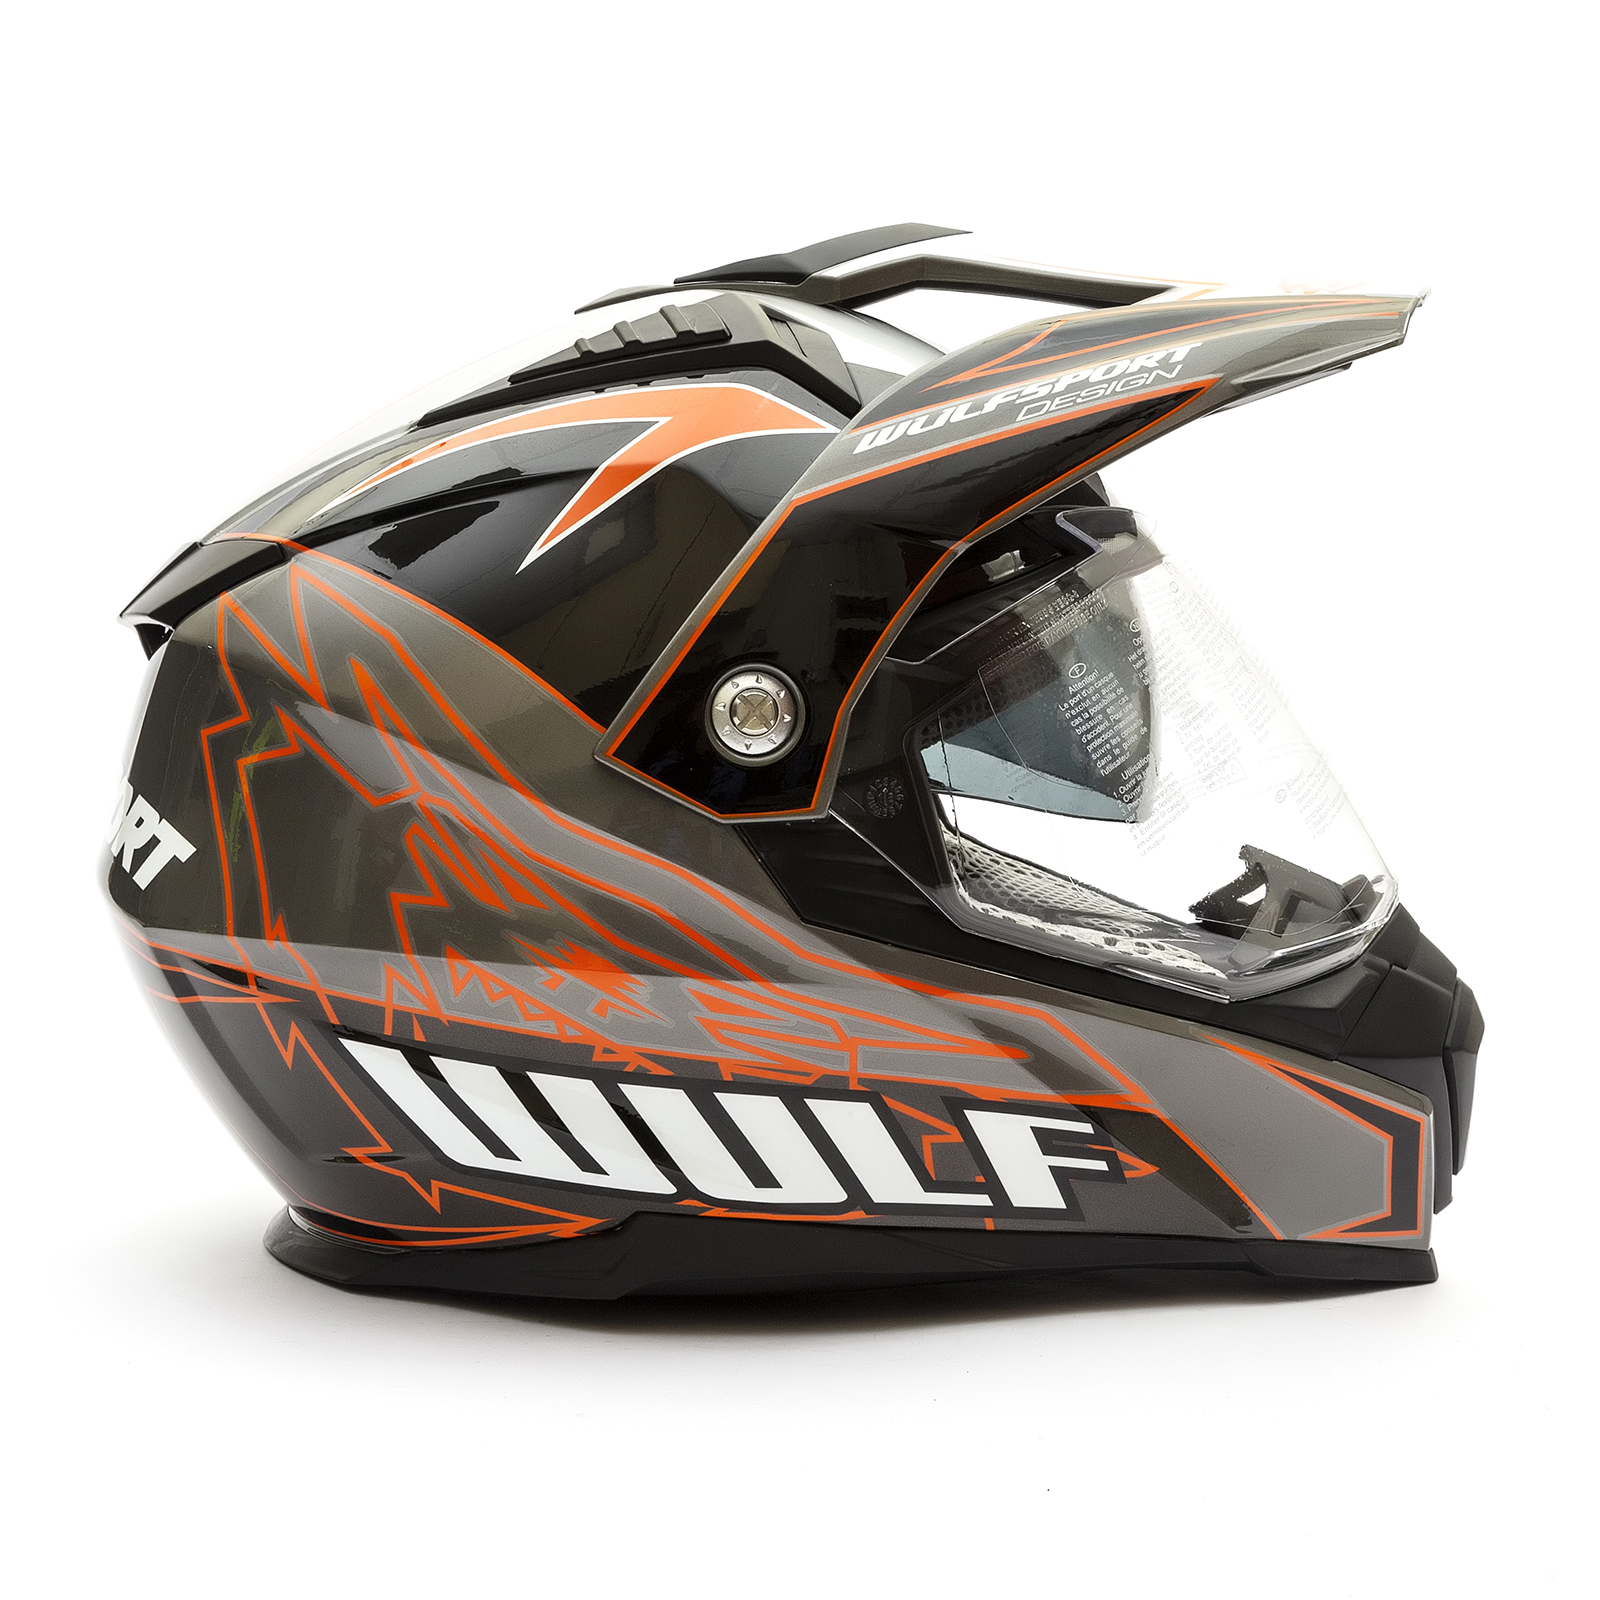 59-60cm Wulfsport 2019 Prima-X Dual Sport Adventure Adult Helmet Road Legal Twin Visor Orange, Adult Large